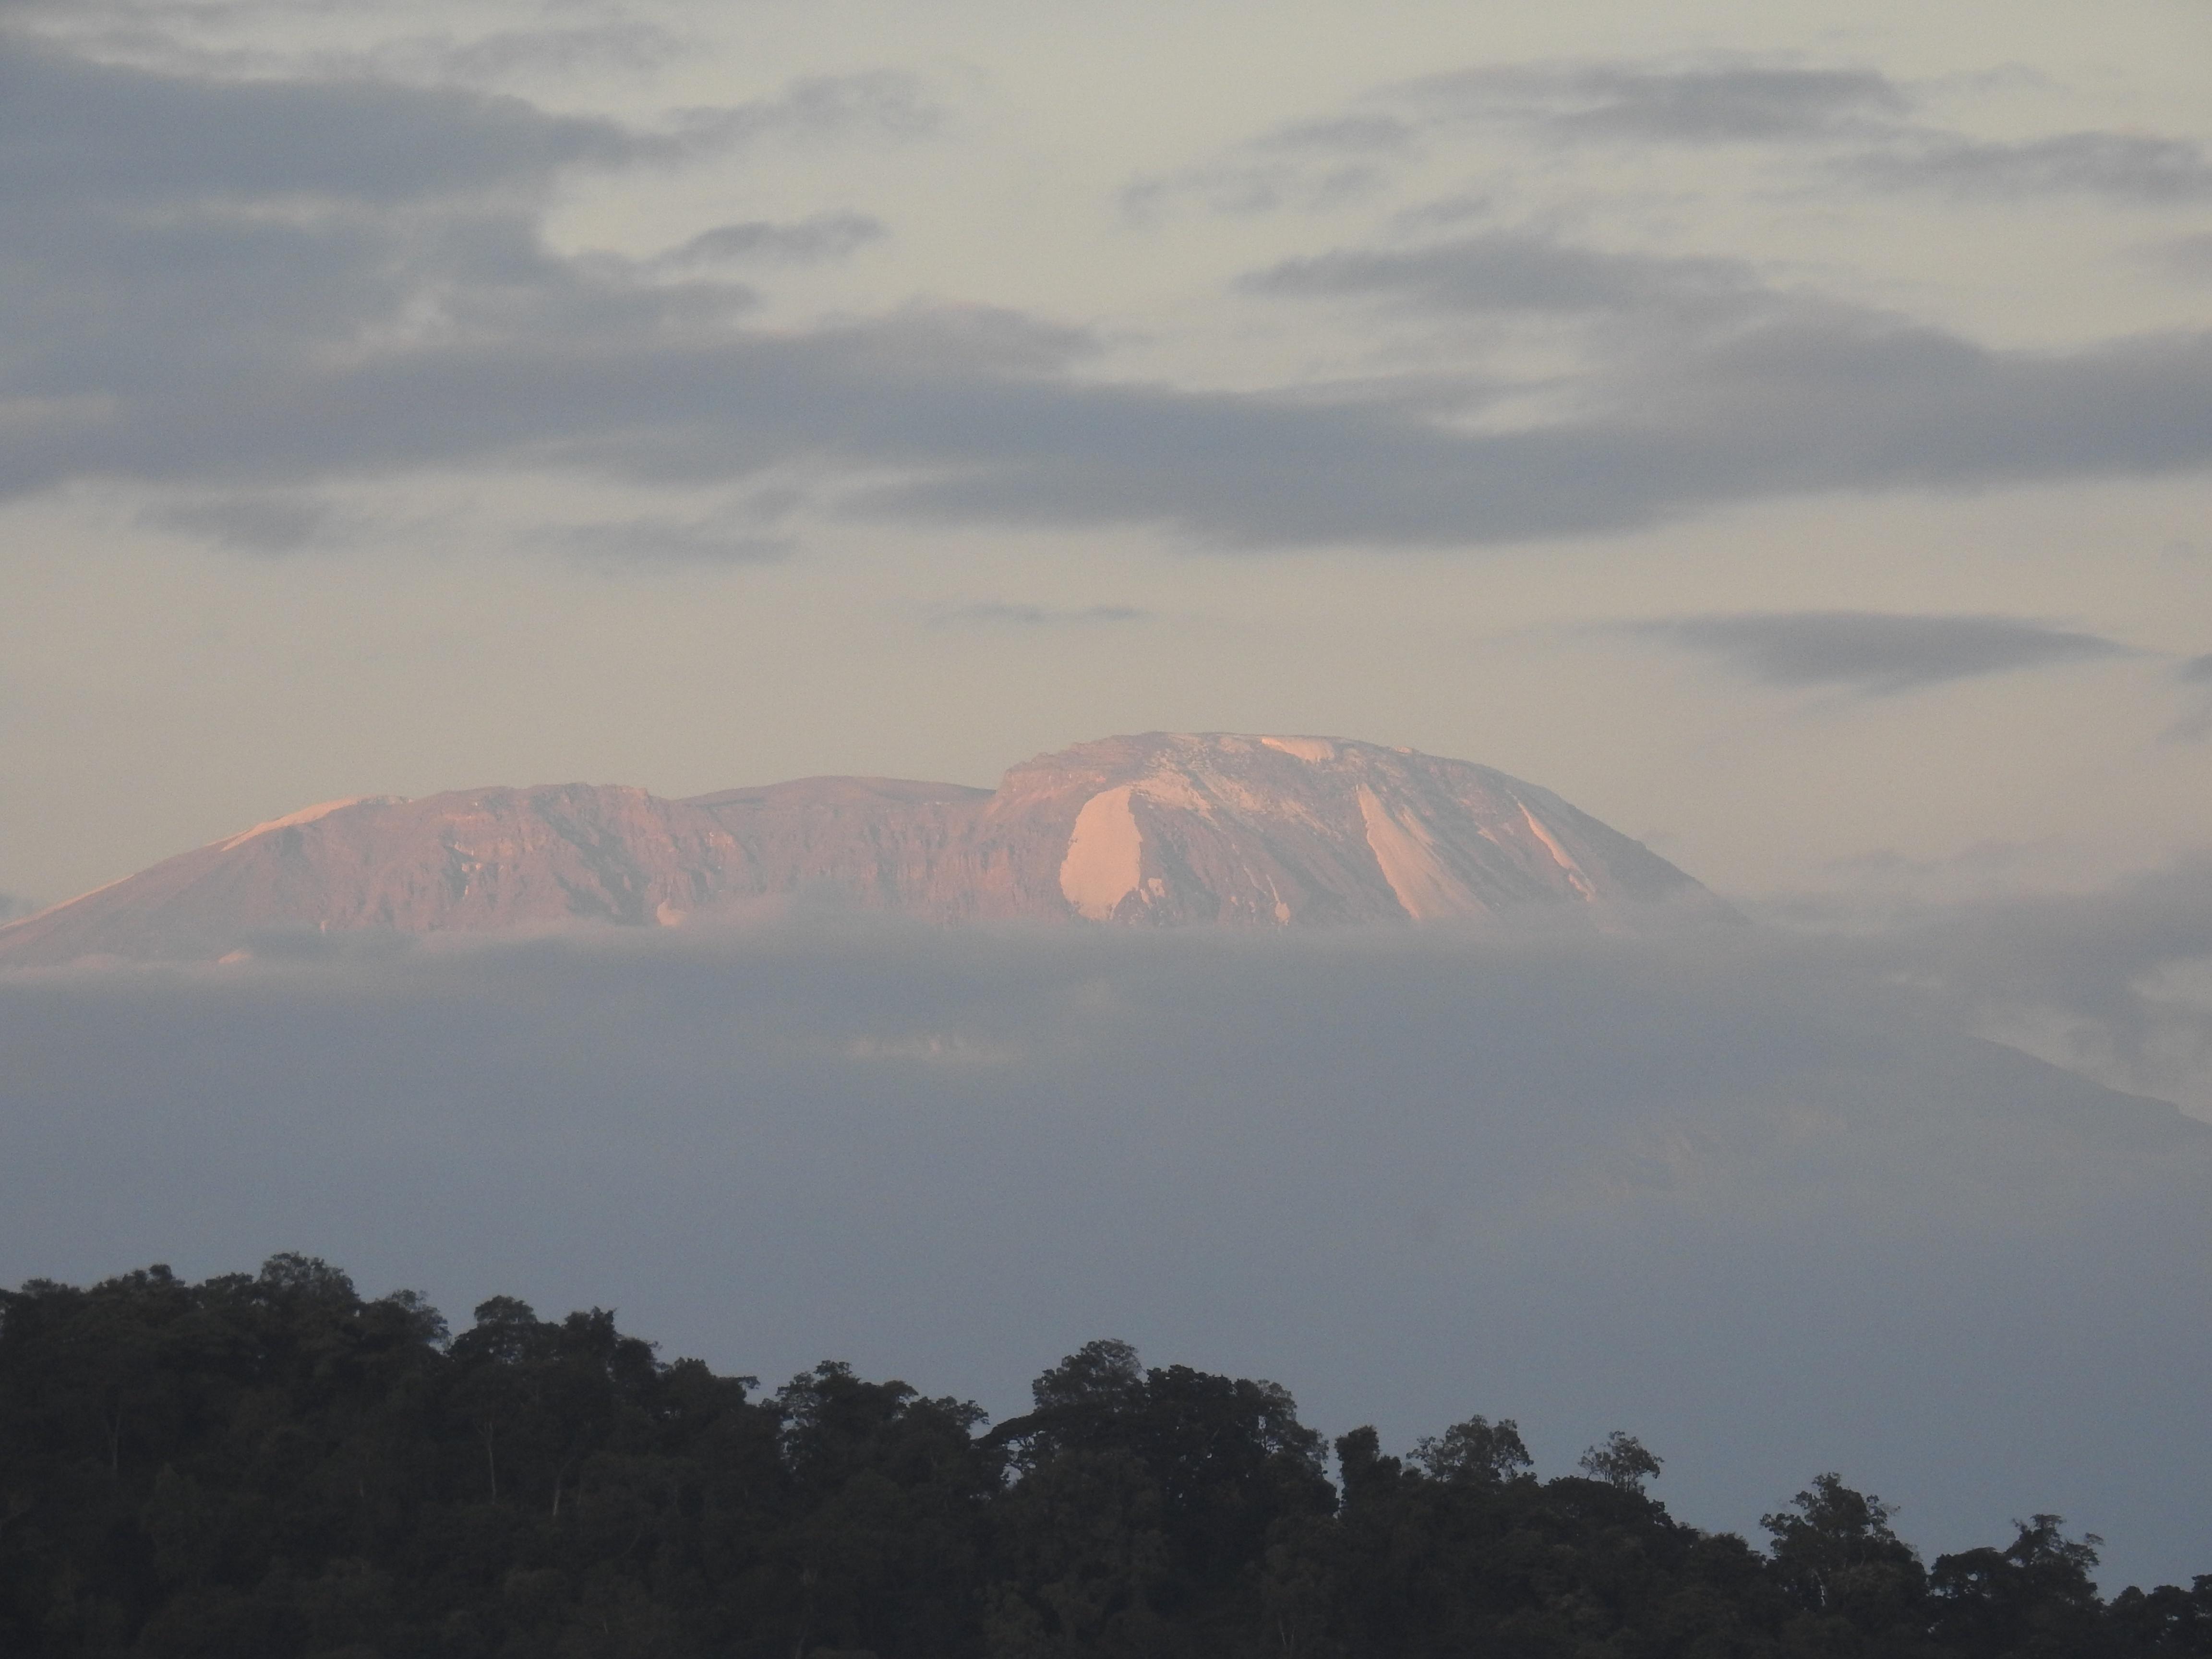 Mt_KilimanjaroJPG.jpg